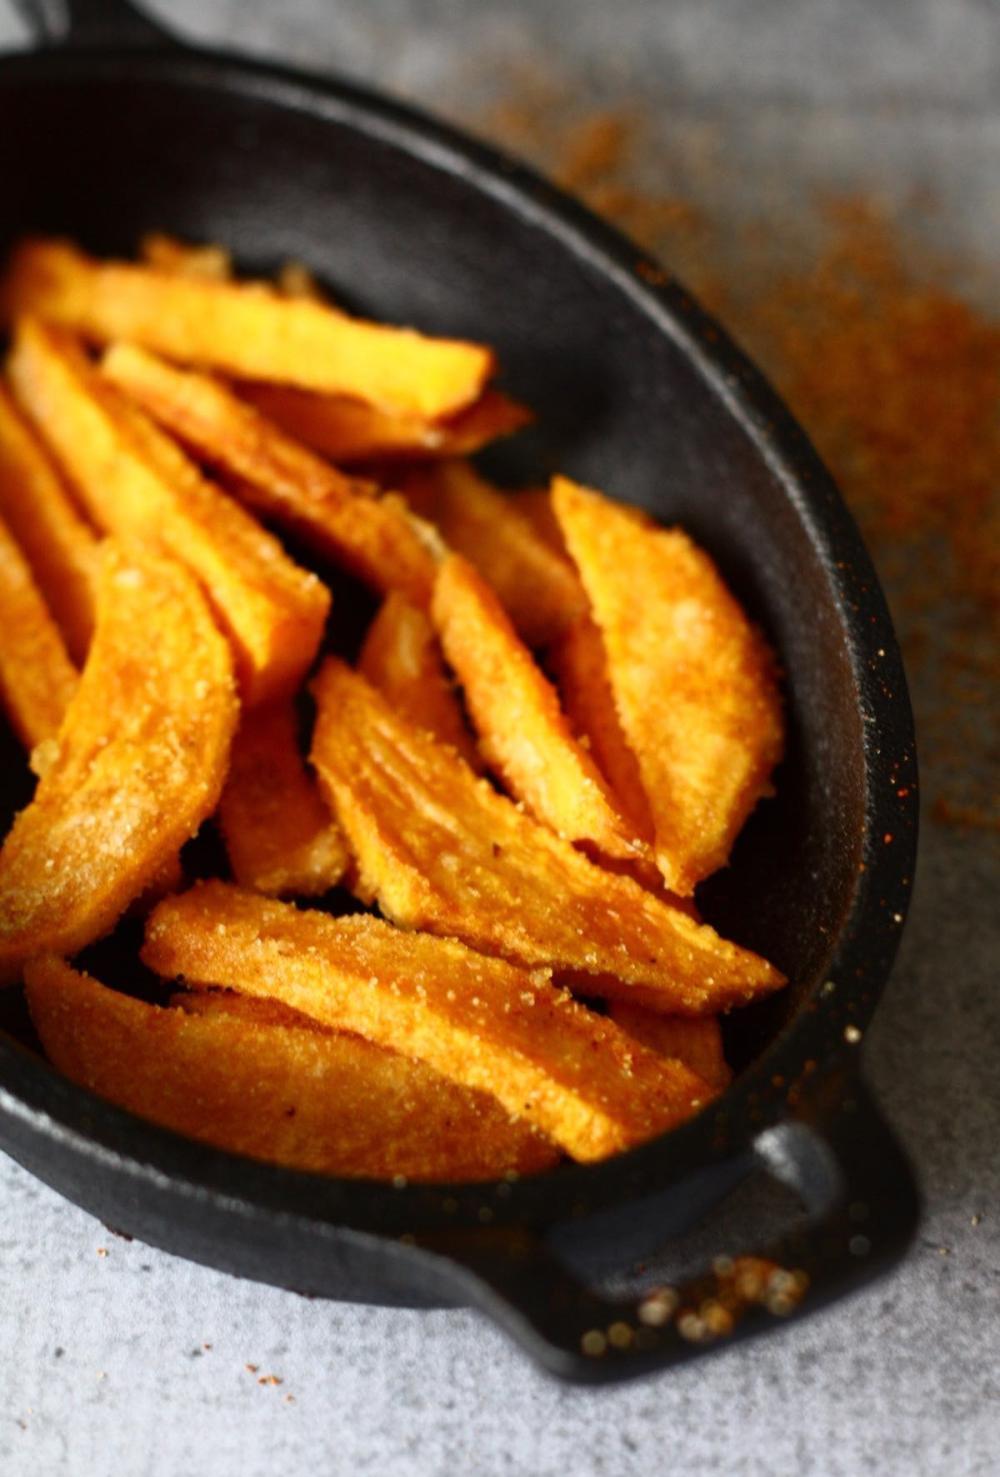 Crispy Sweet Potato Fries with Spice Mix